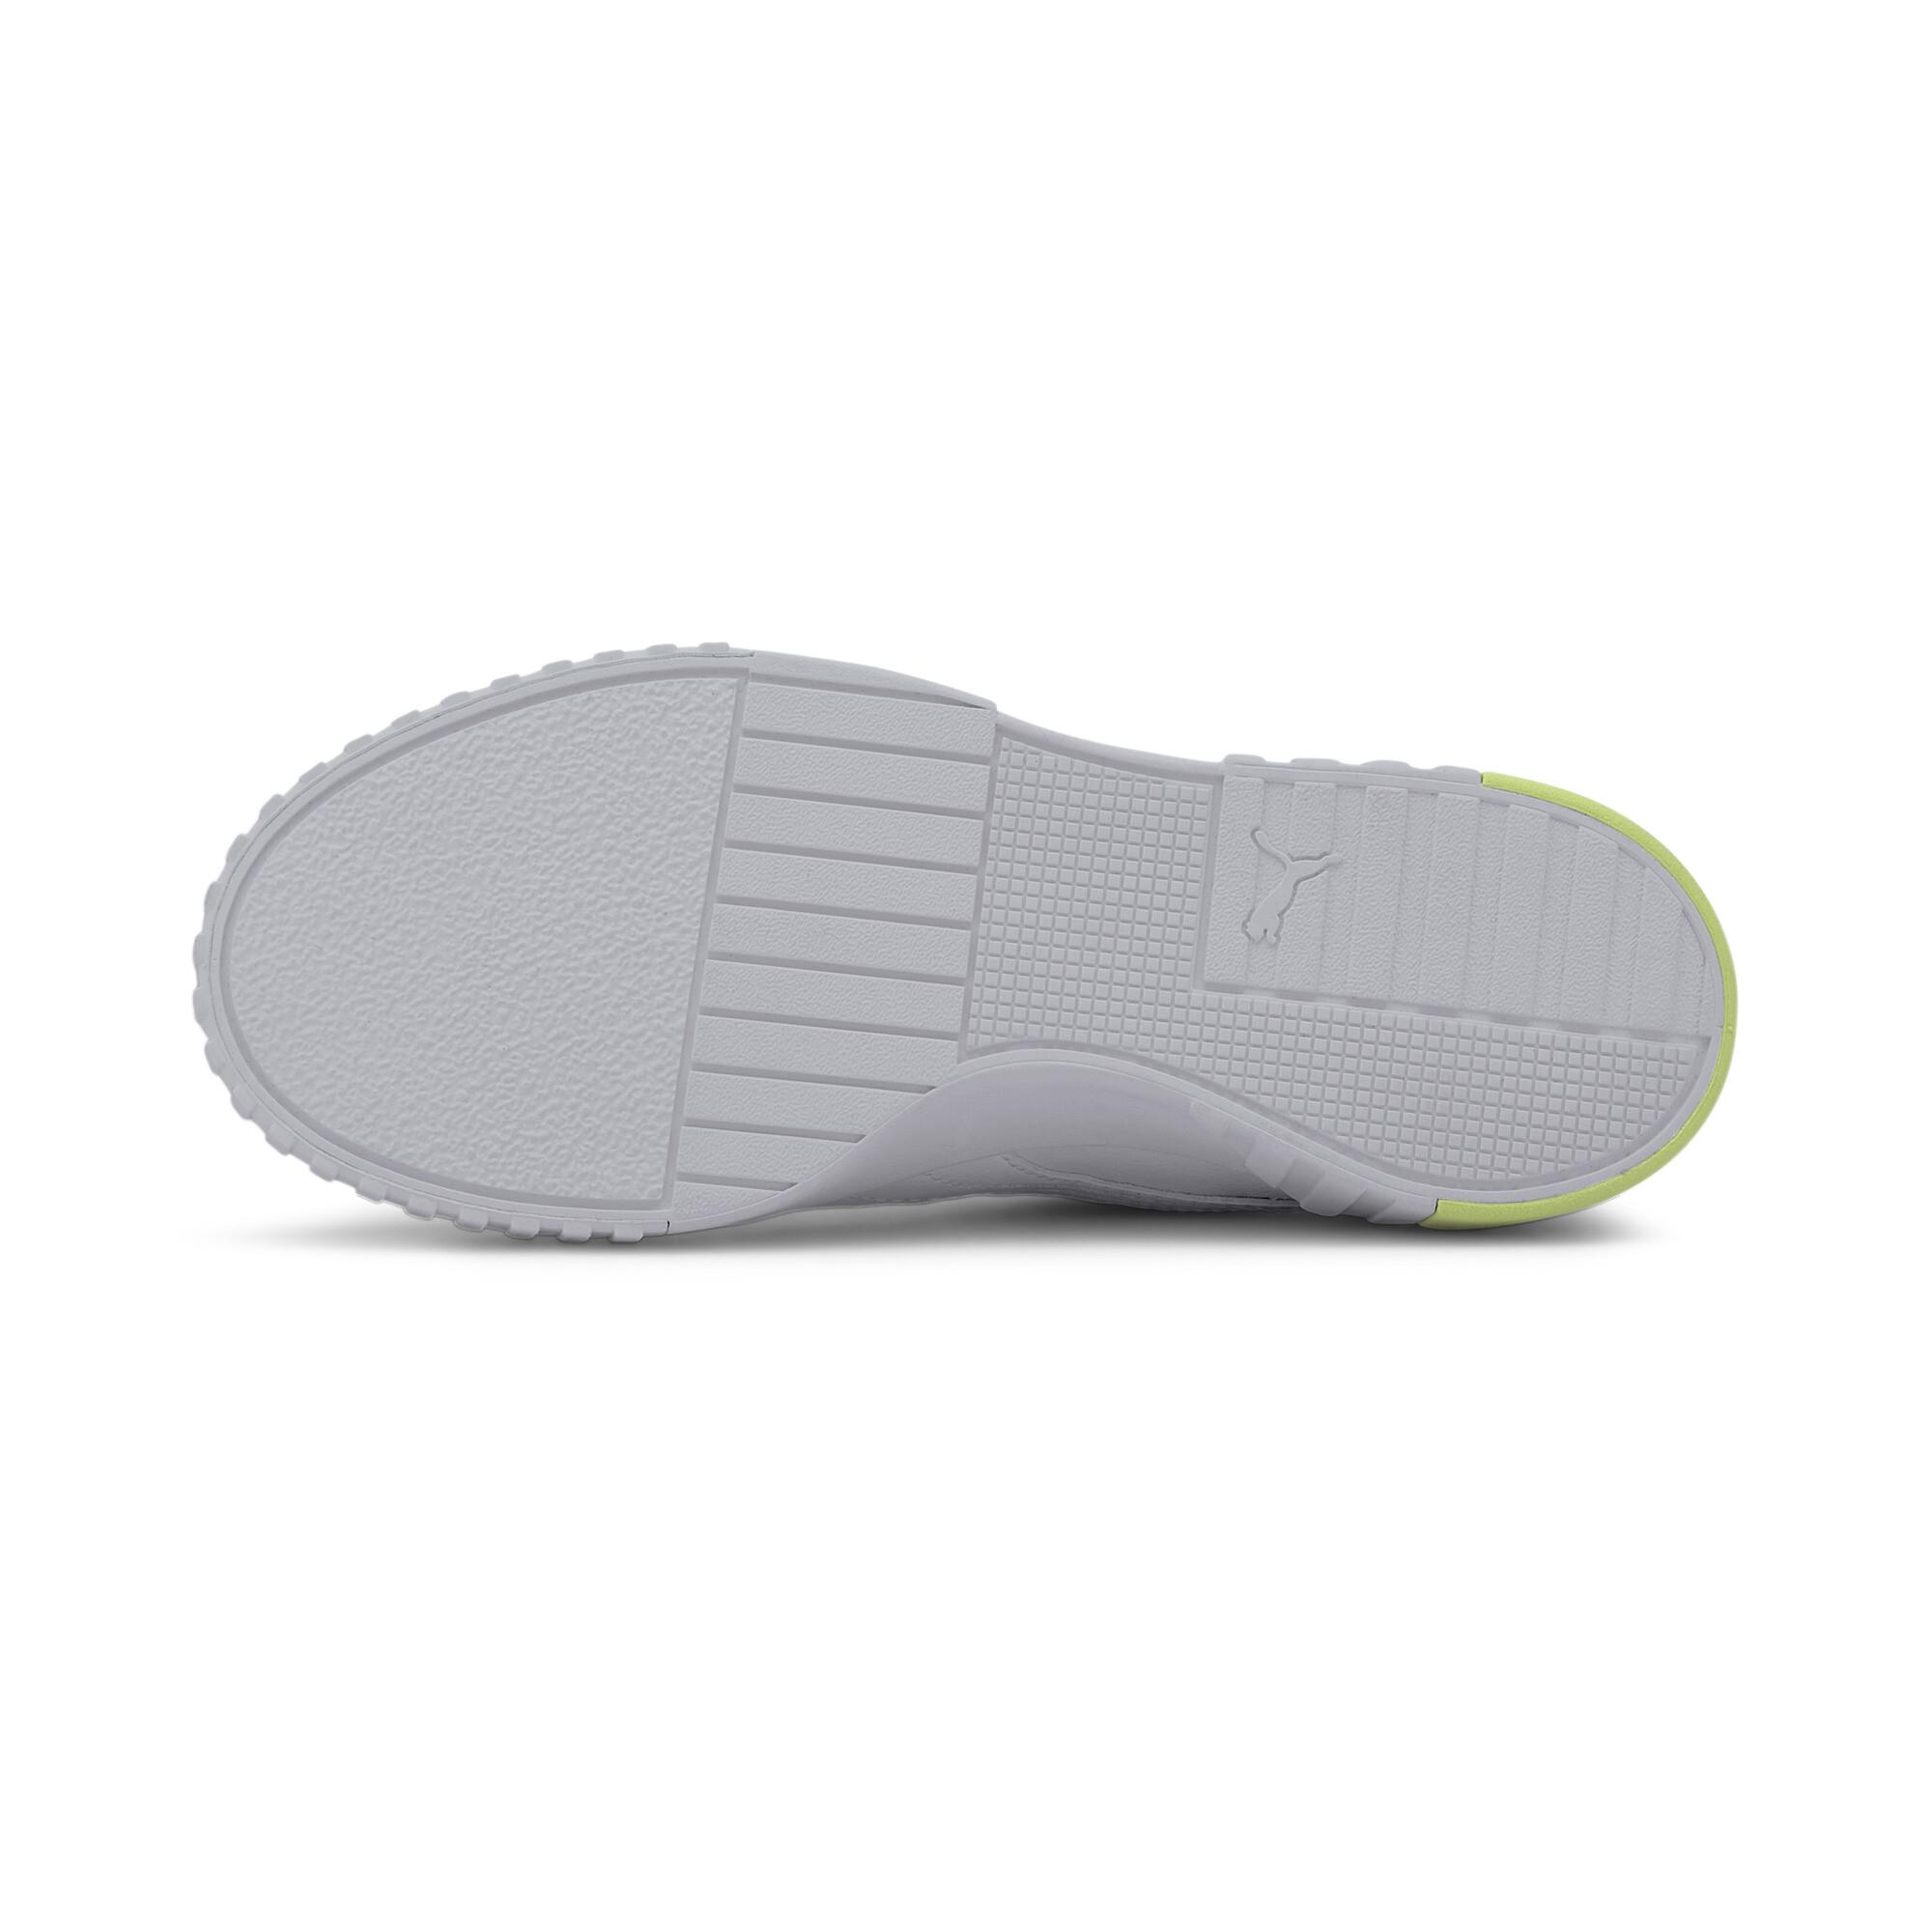 PUMA-Women-039-s-Cali-Sneakers thumbnail 16